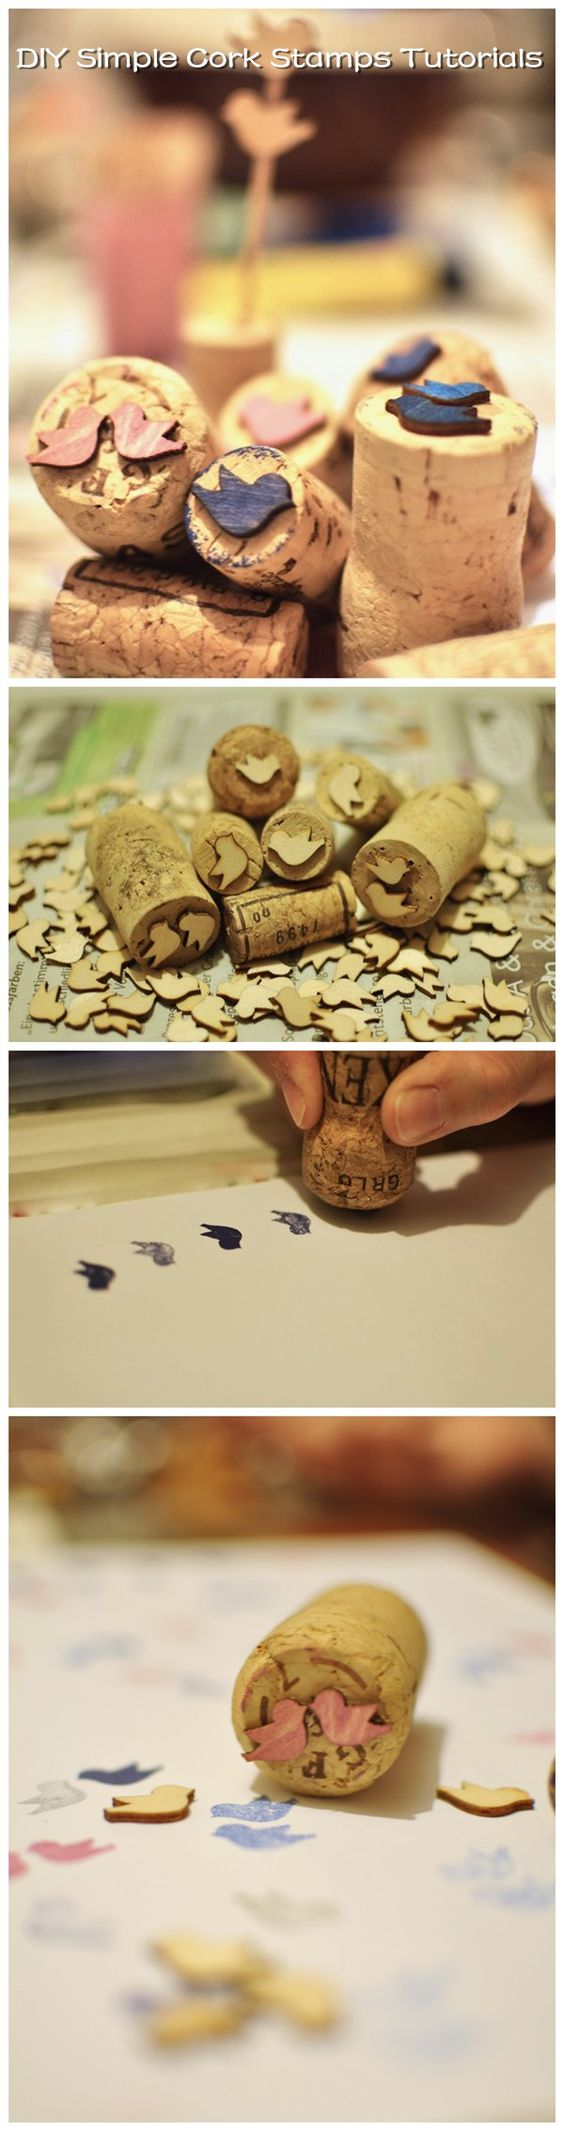 Diy simple cork stamps tutorials weeding pinterest for Simple cork